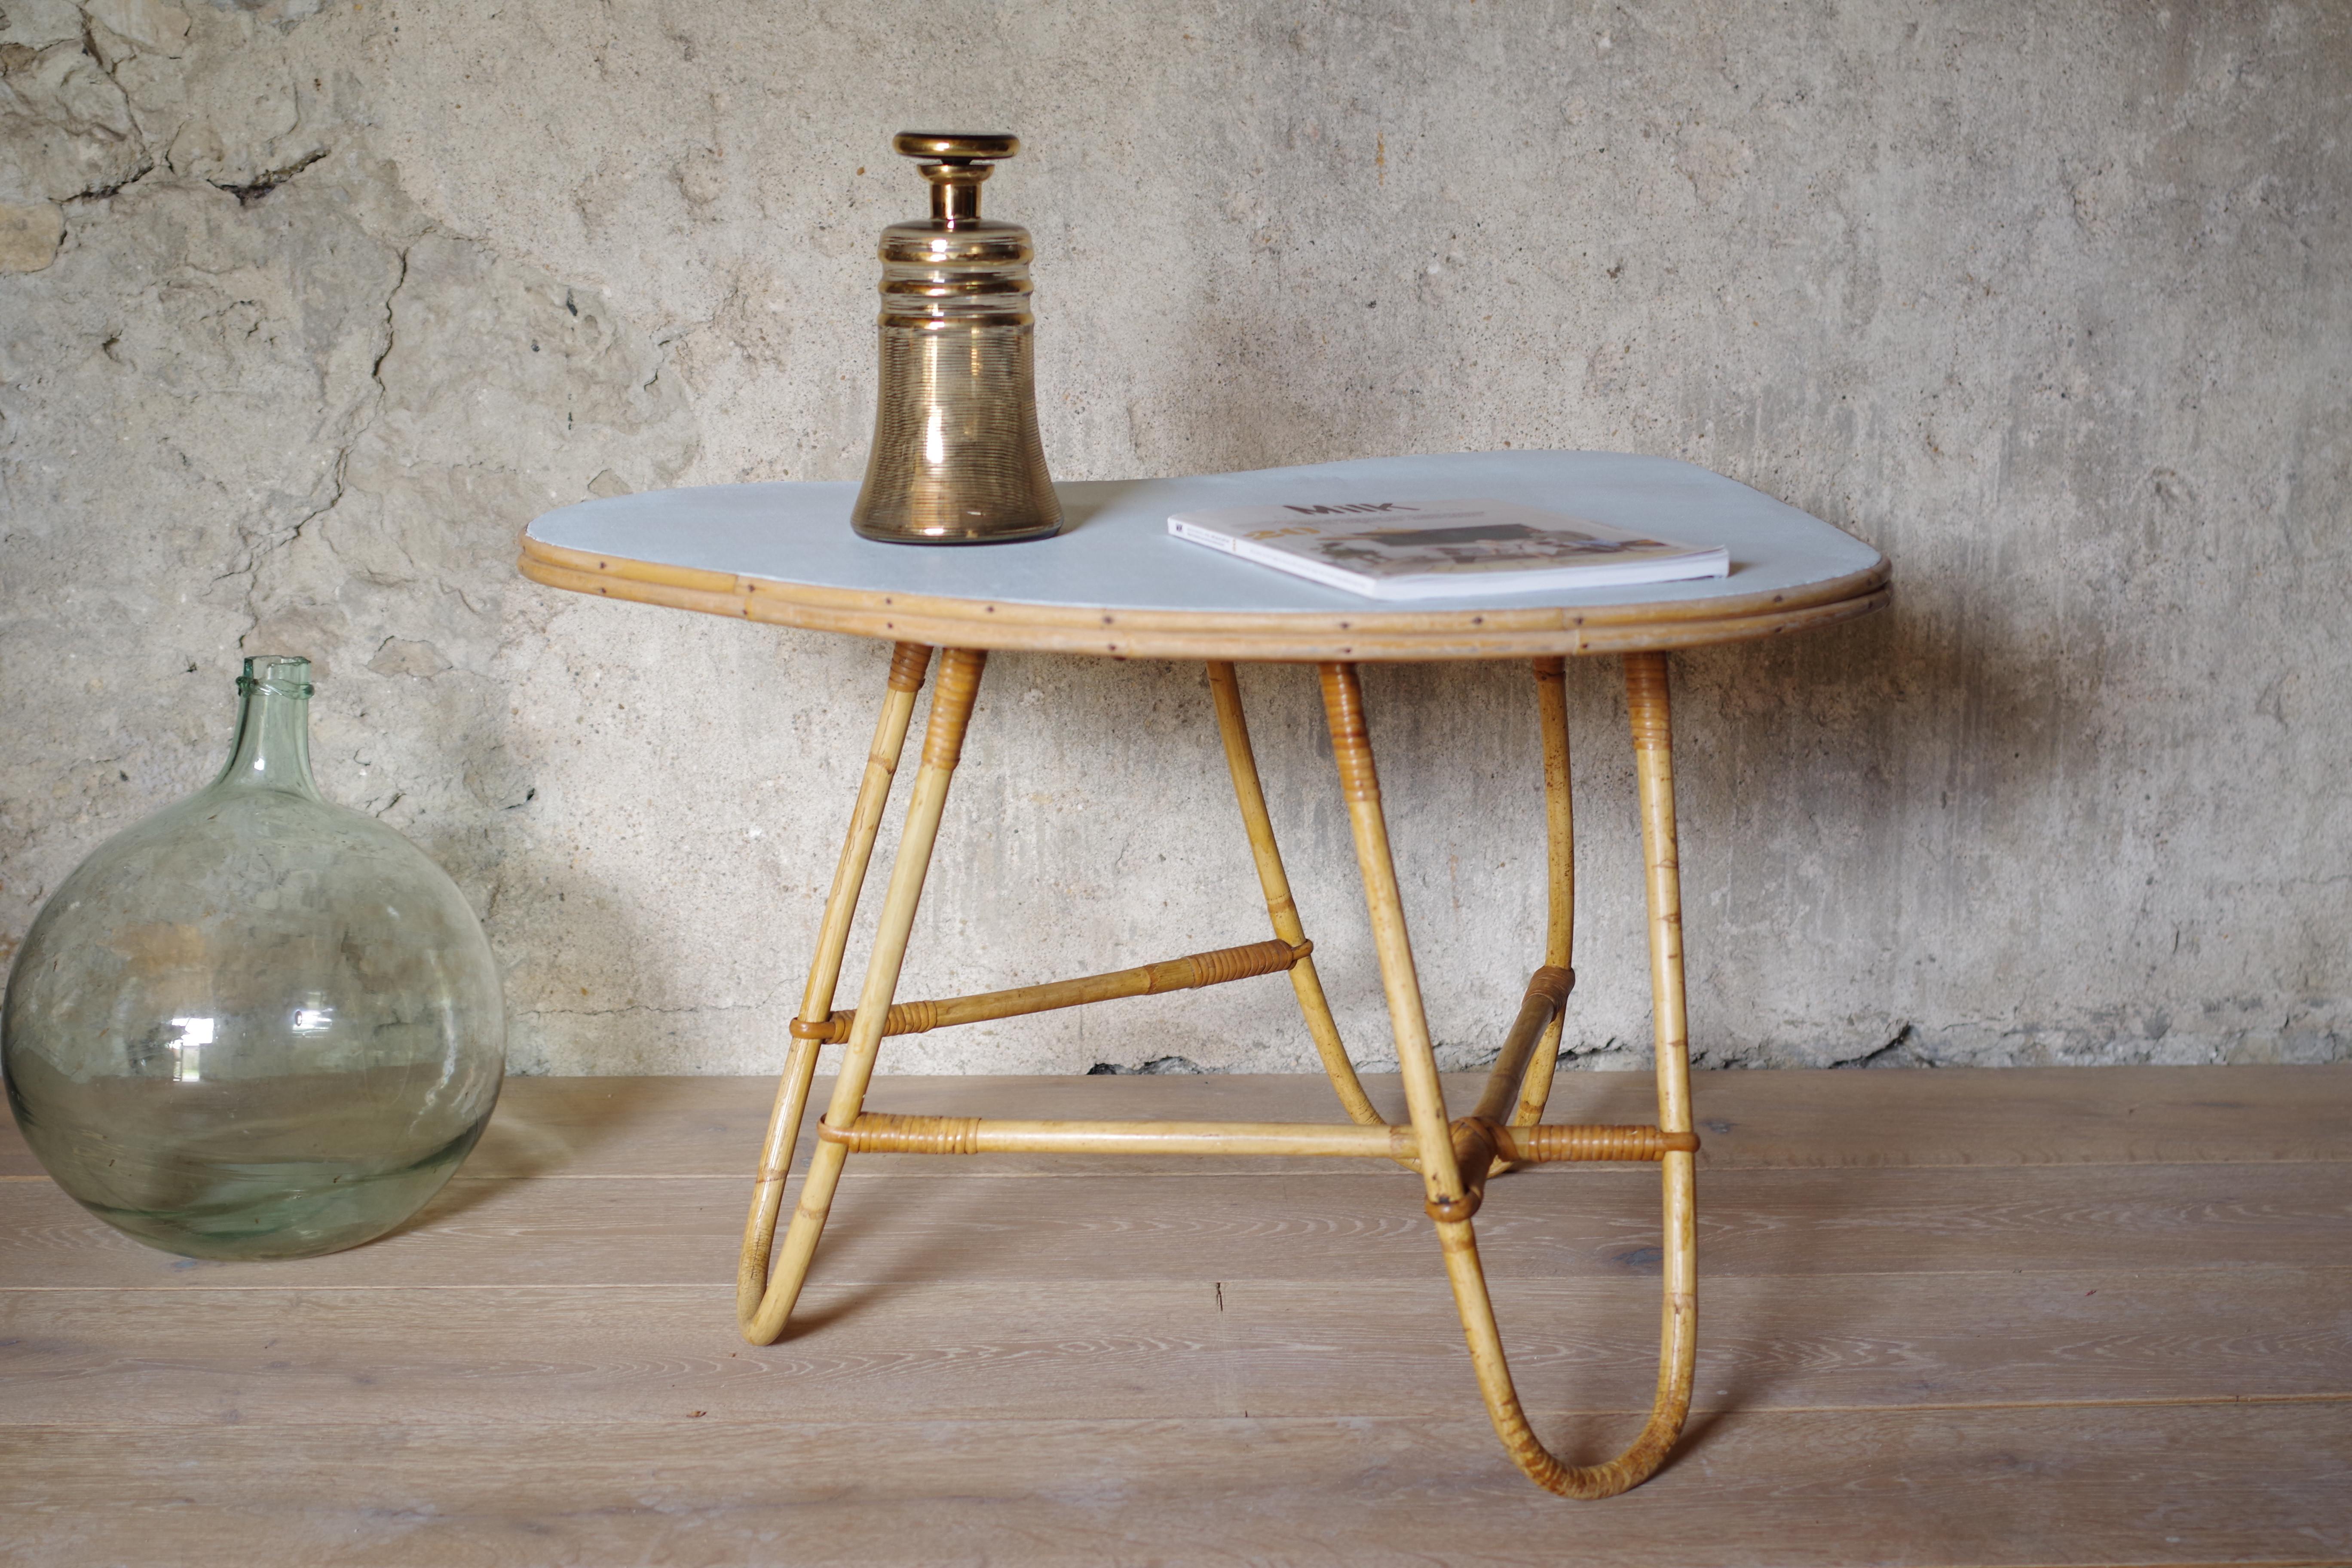 Table Basse Bambou Rotin Plateau Haricot Vintage Les Vieilles Choses